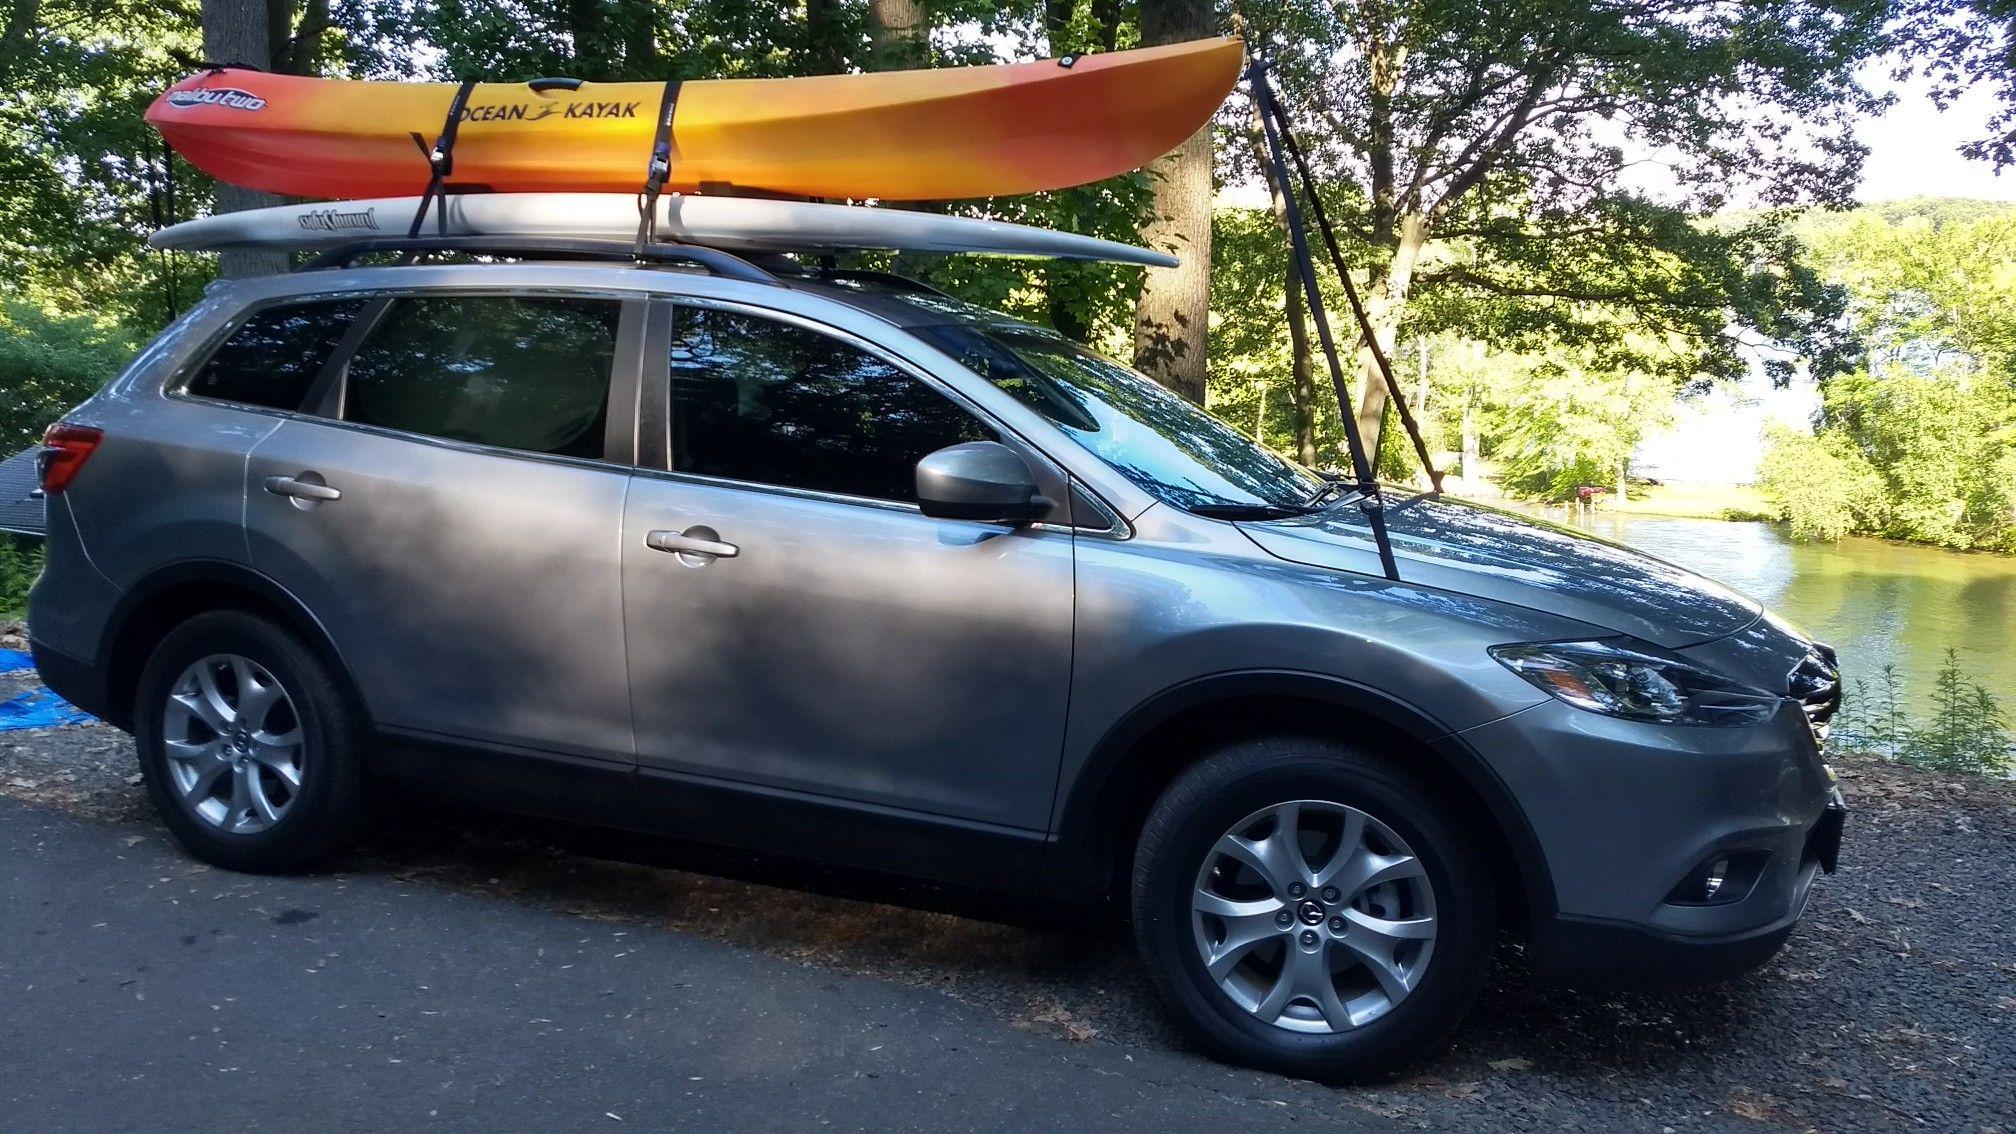 2014 Mazda Cx 9 Kayak And Paddle Board Mazda Cx 9 Lexus Sport Lexus Sports Car